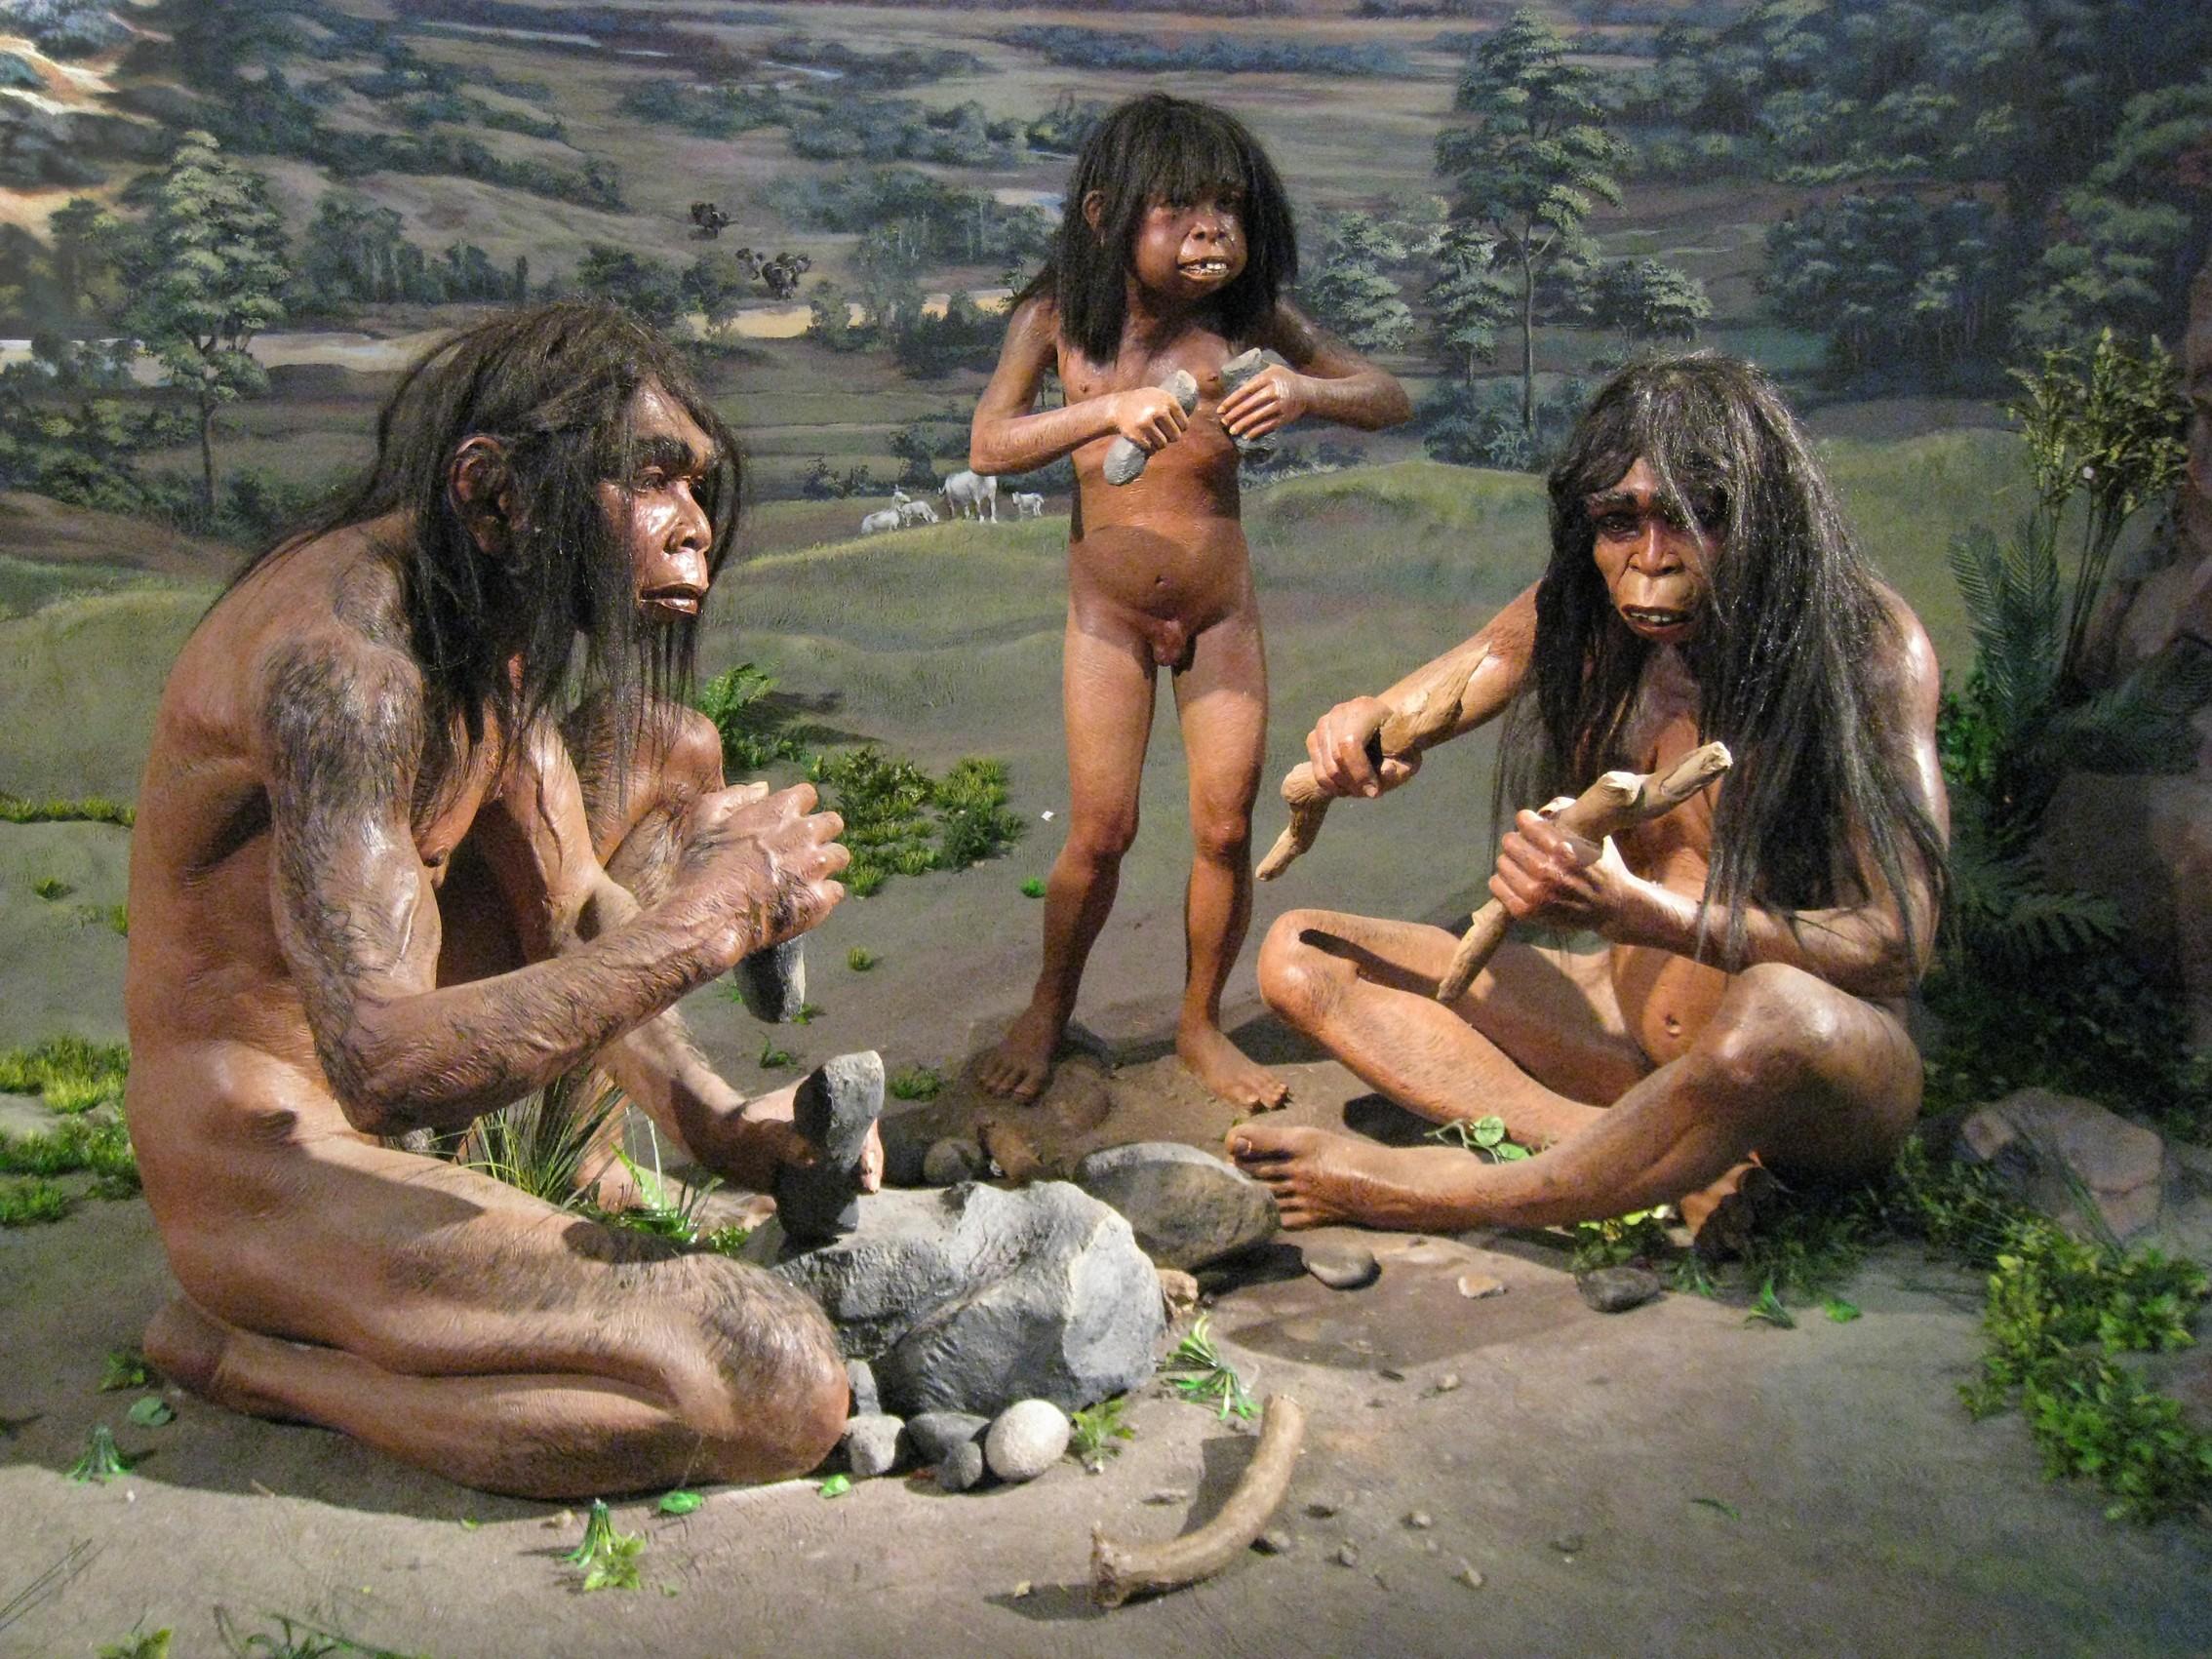 секс древних людей порно